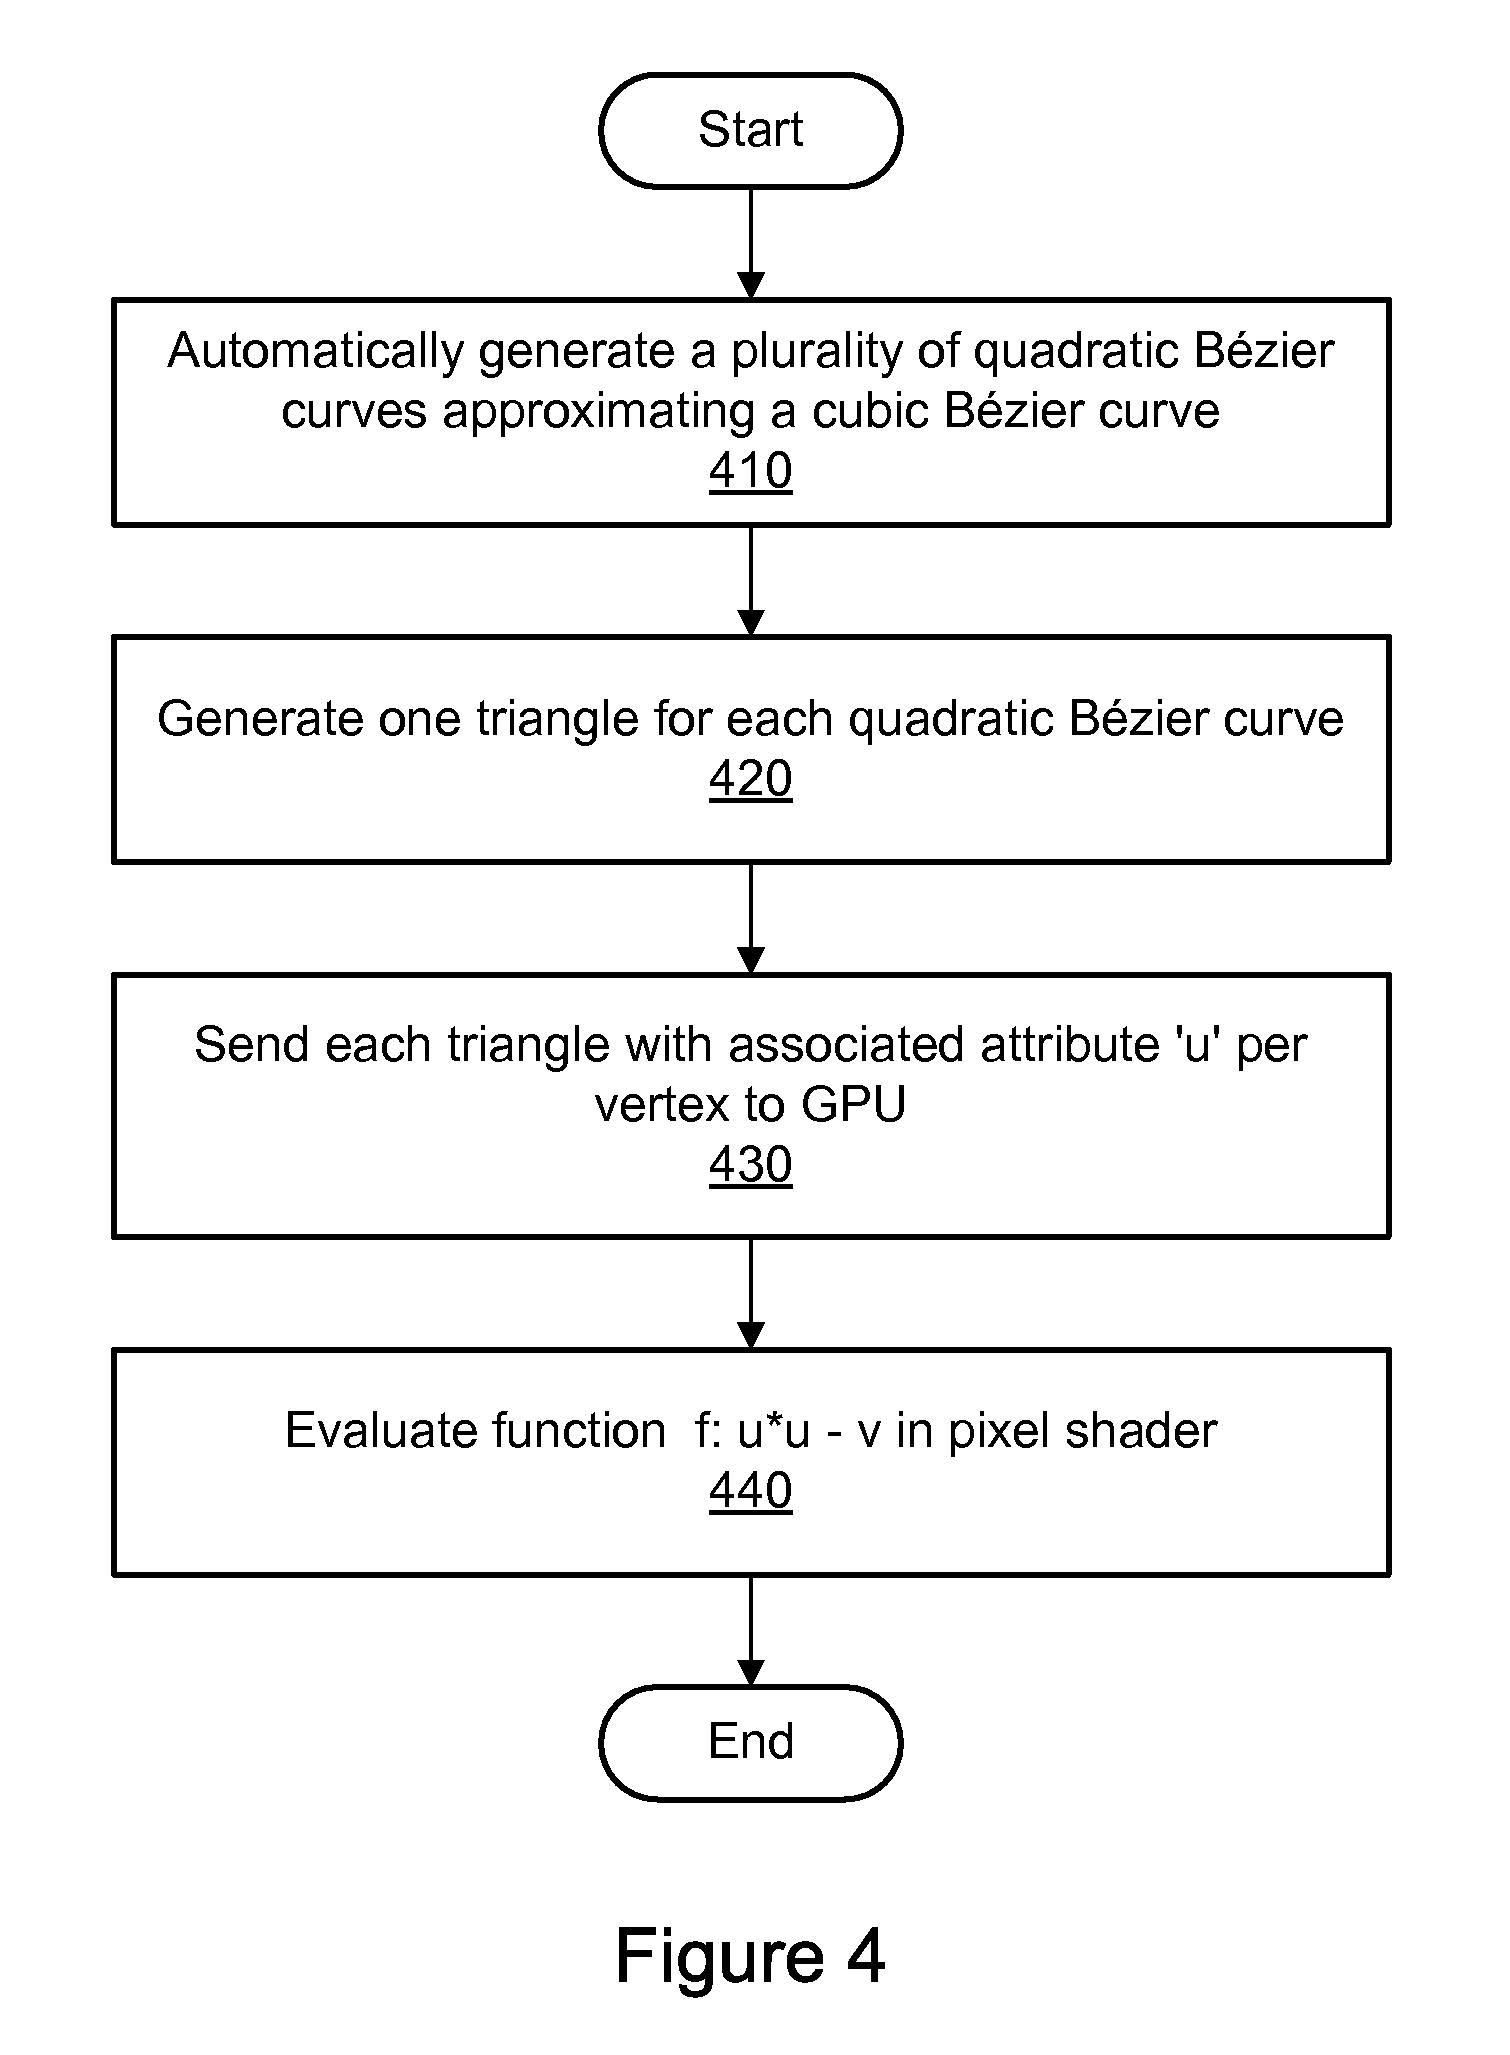 براءة الاختراع US7868887 - Rendering rational quadratic Bézier